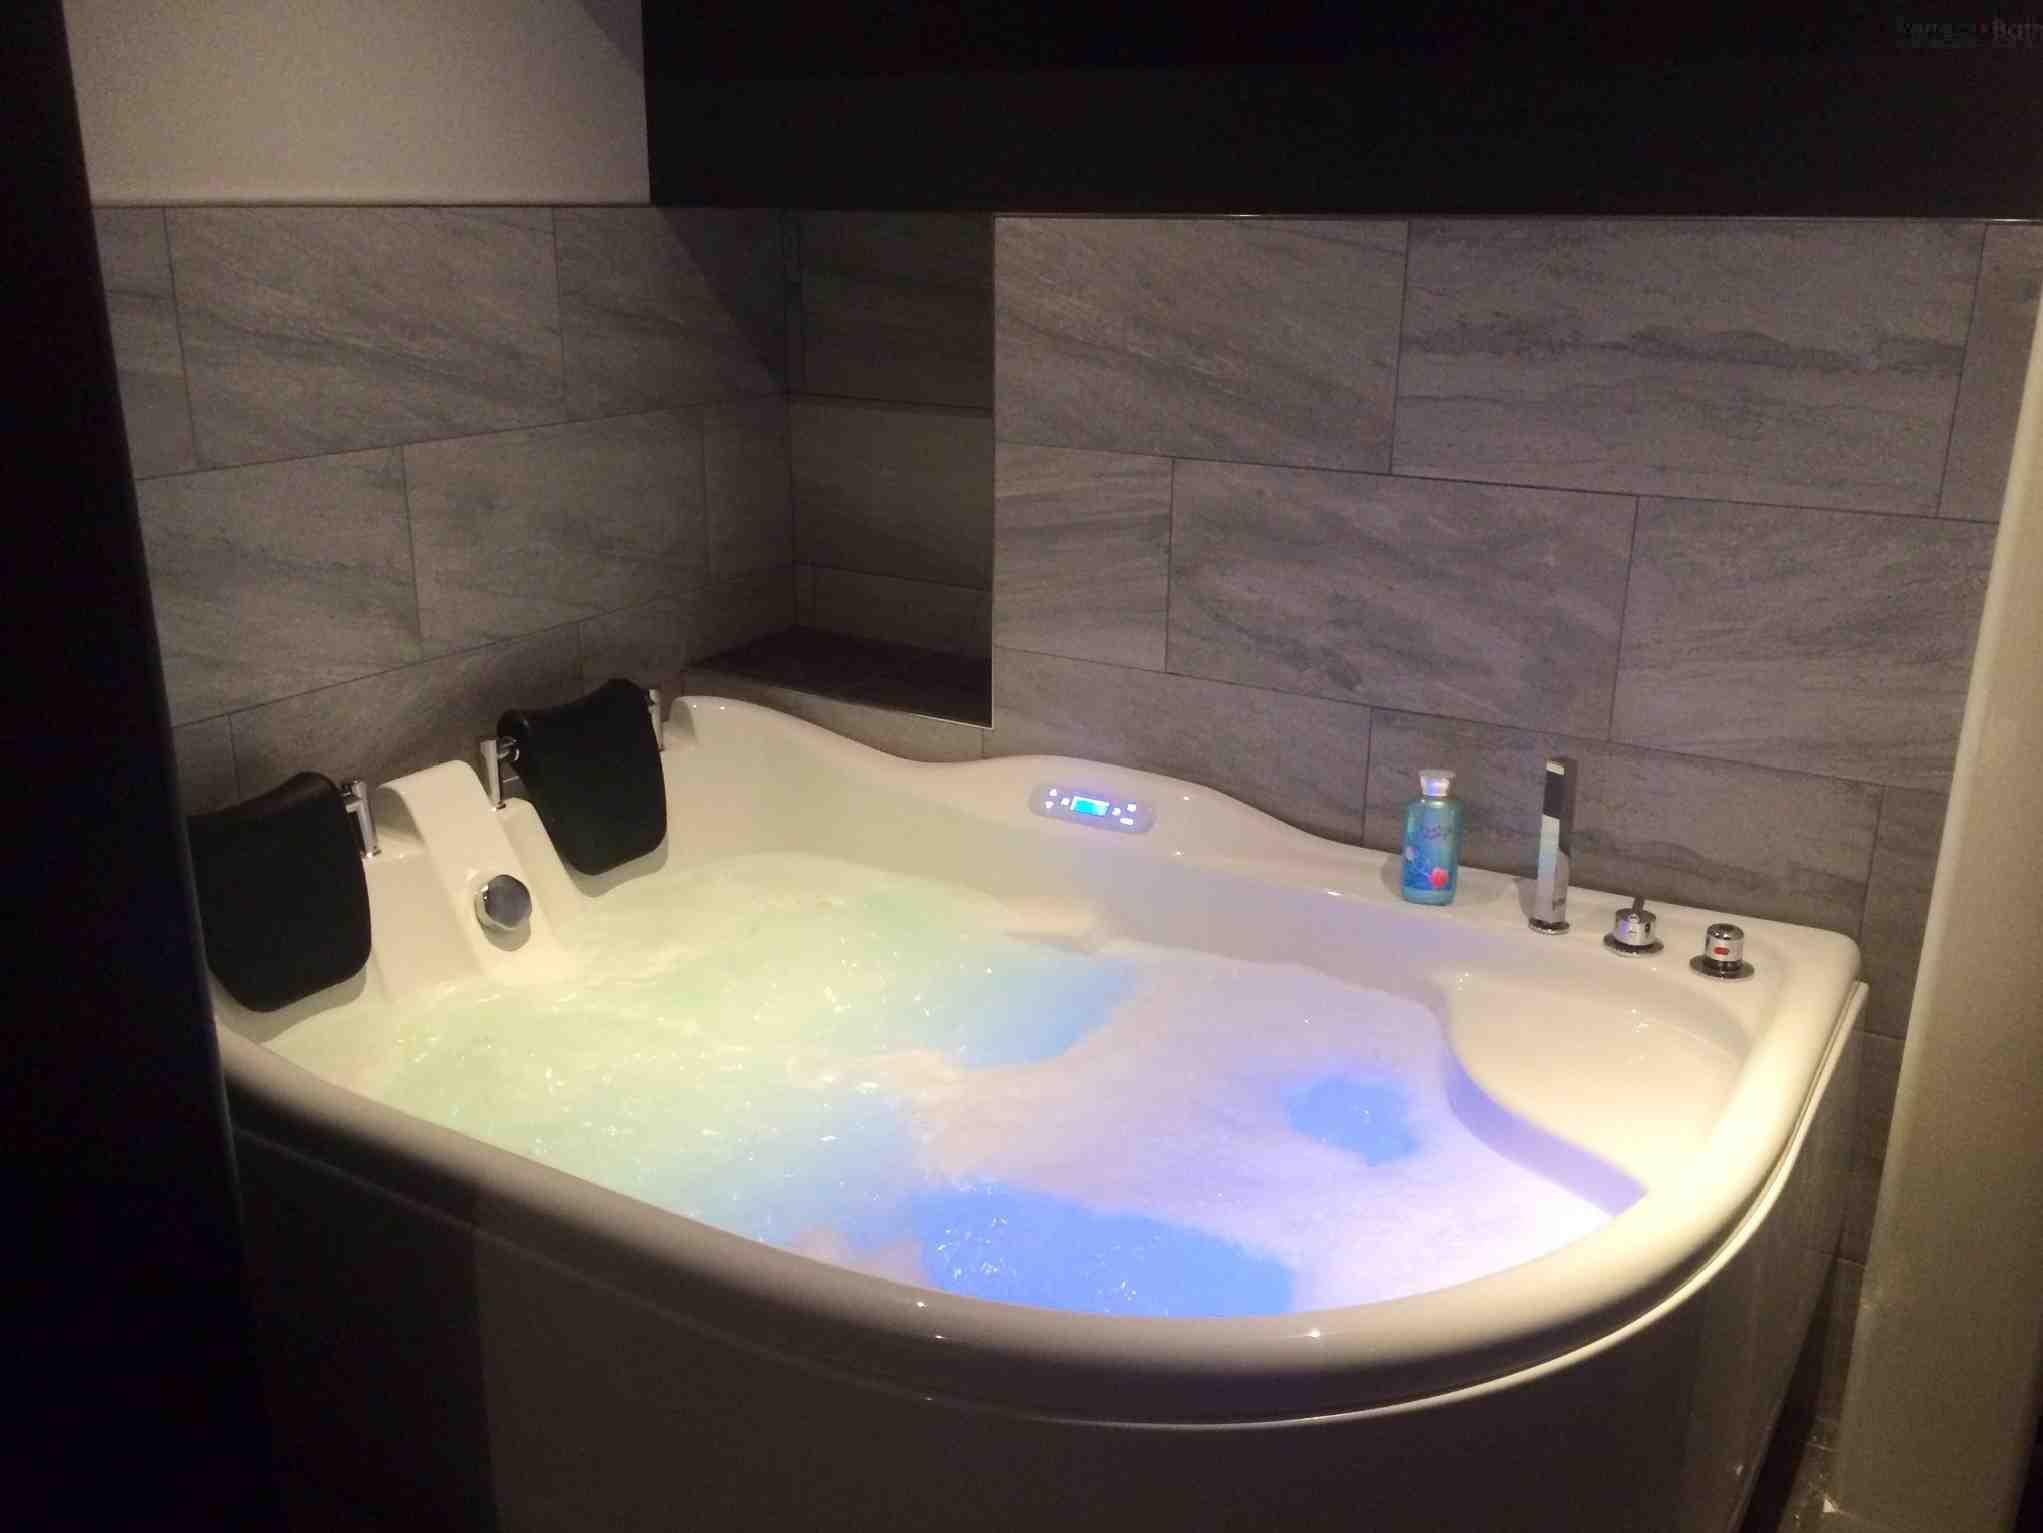 bathtubs bathtub corner center p american drop person whirlpool universal drain in non standard white everclean acrylic tubs